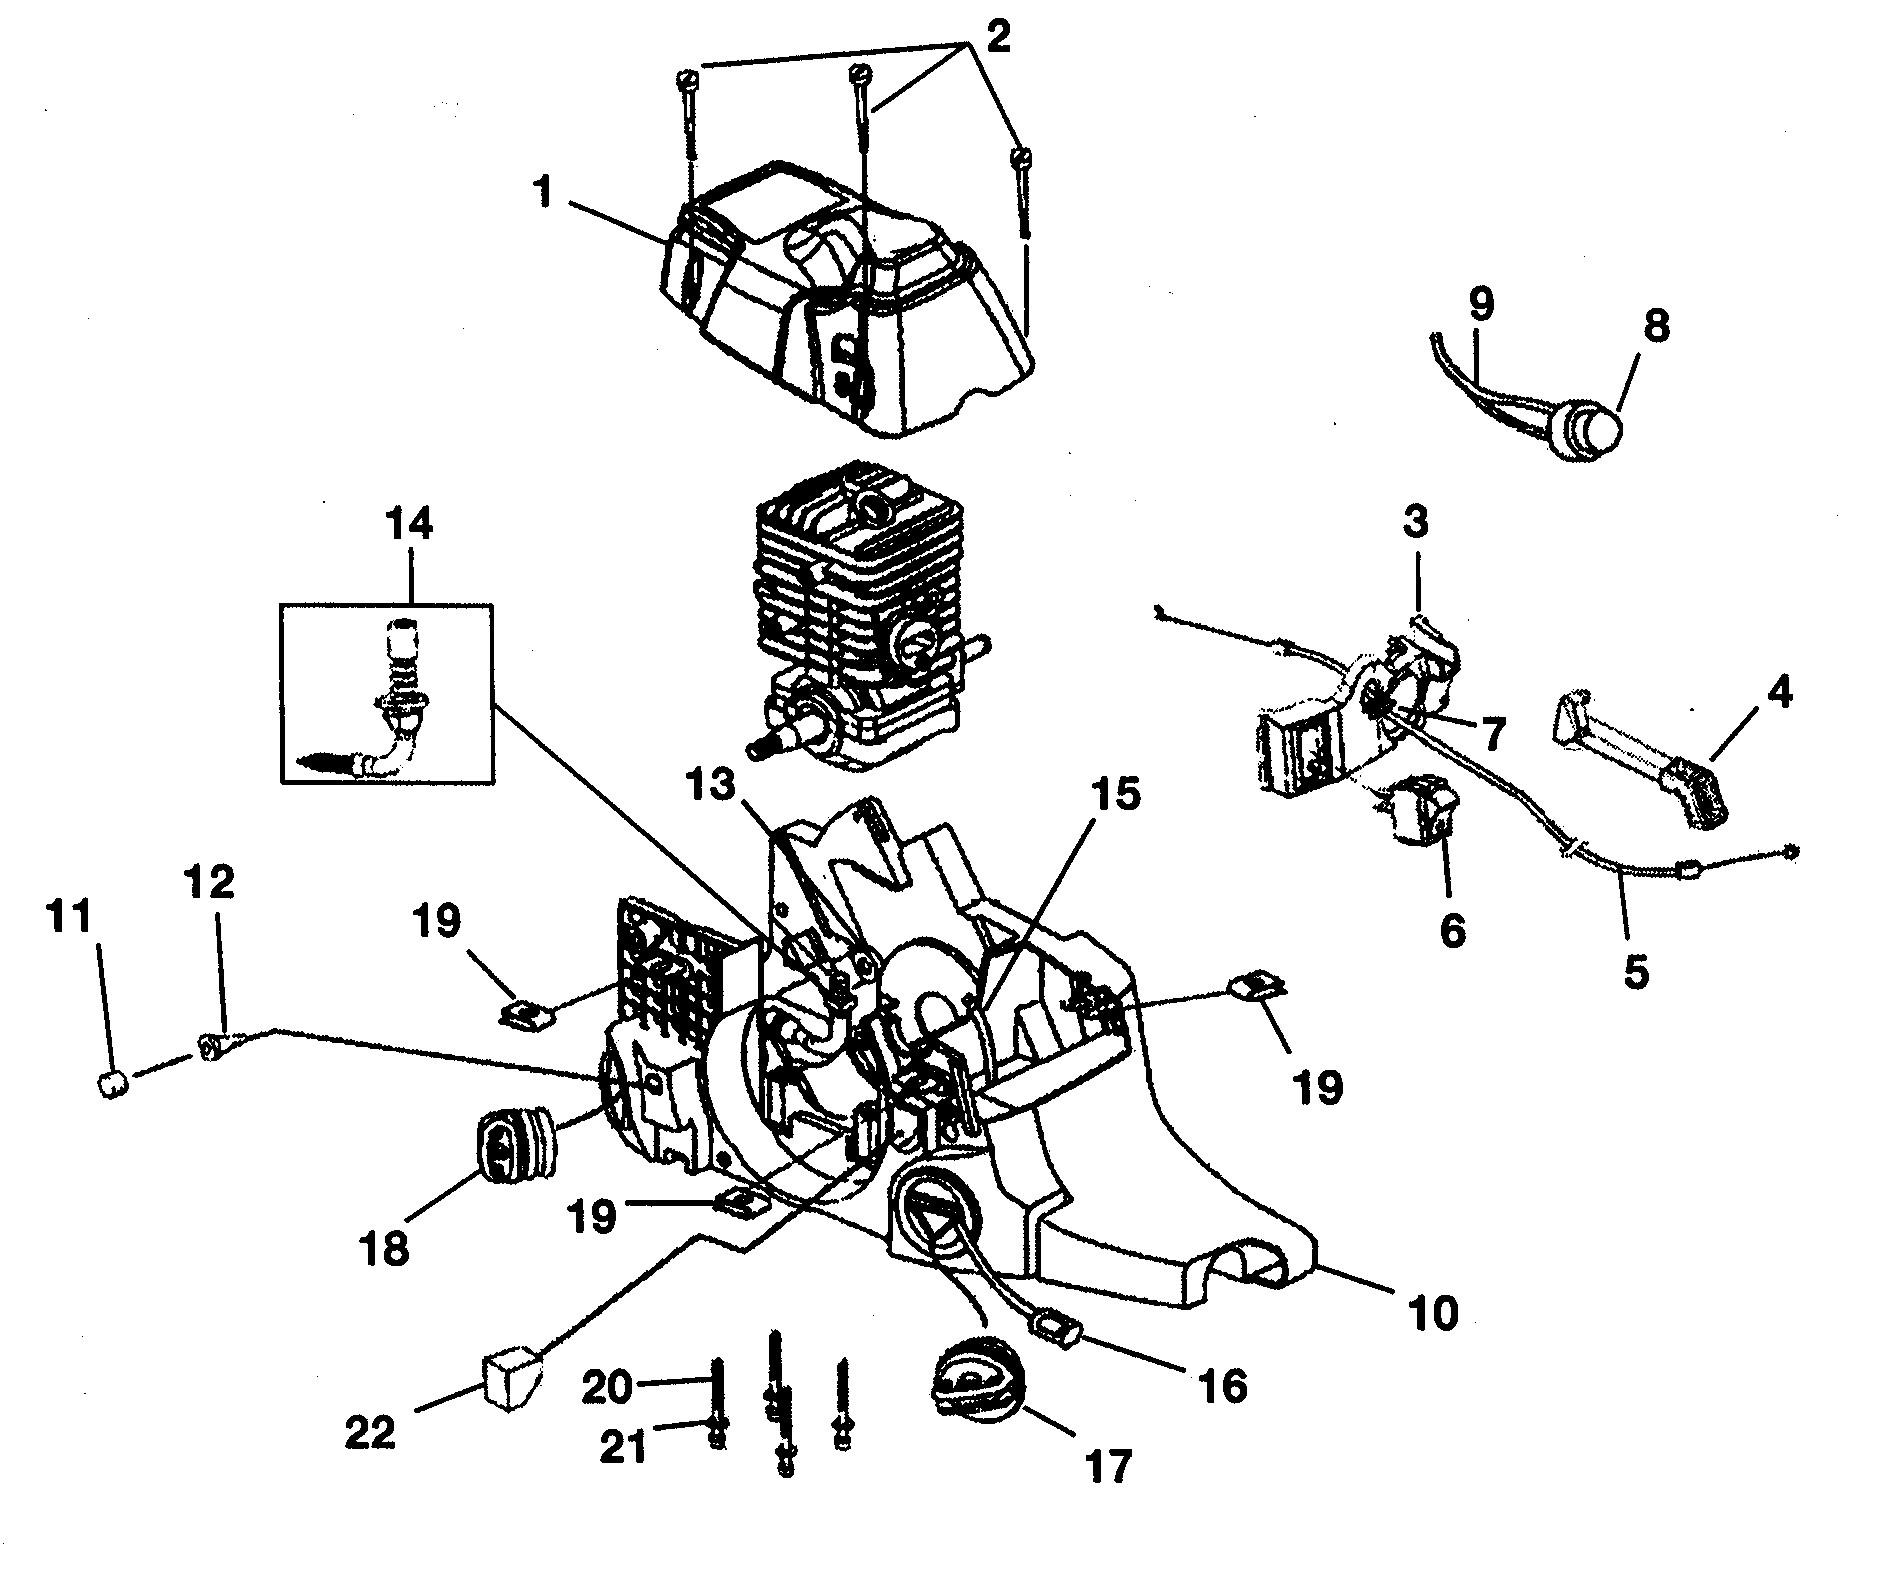 Homelite 360 Chainsaw Parts Diagram